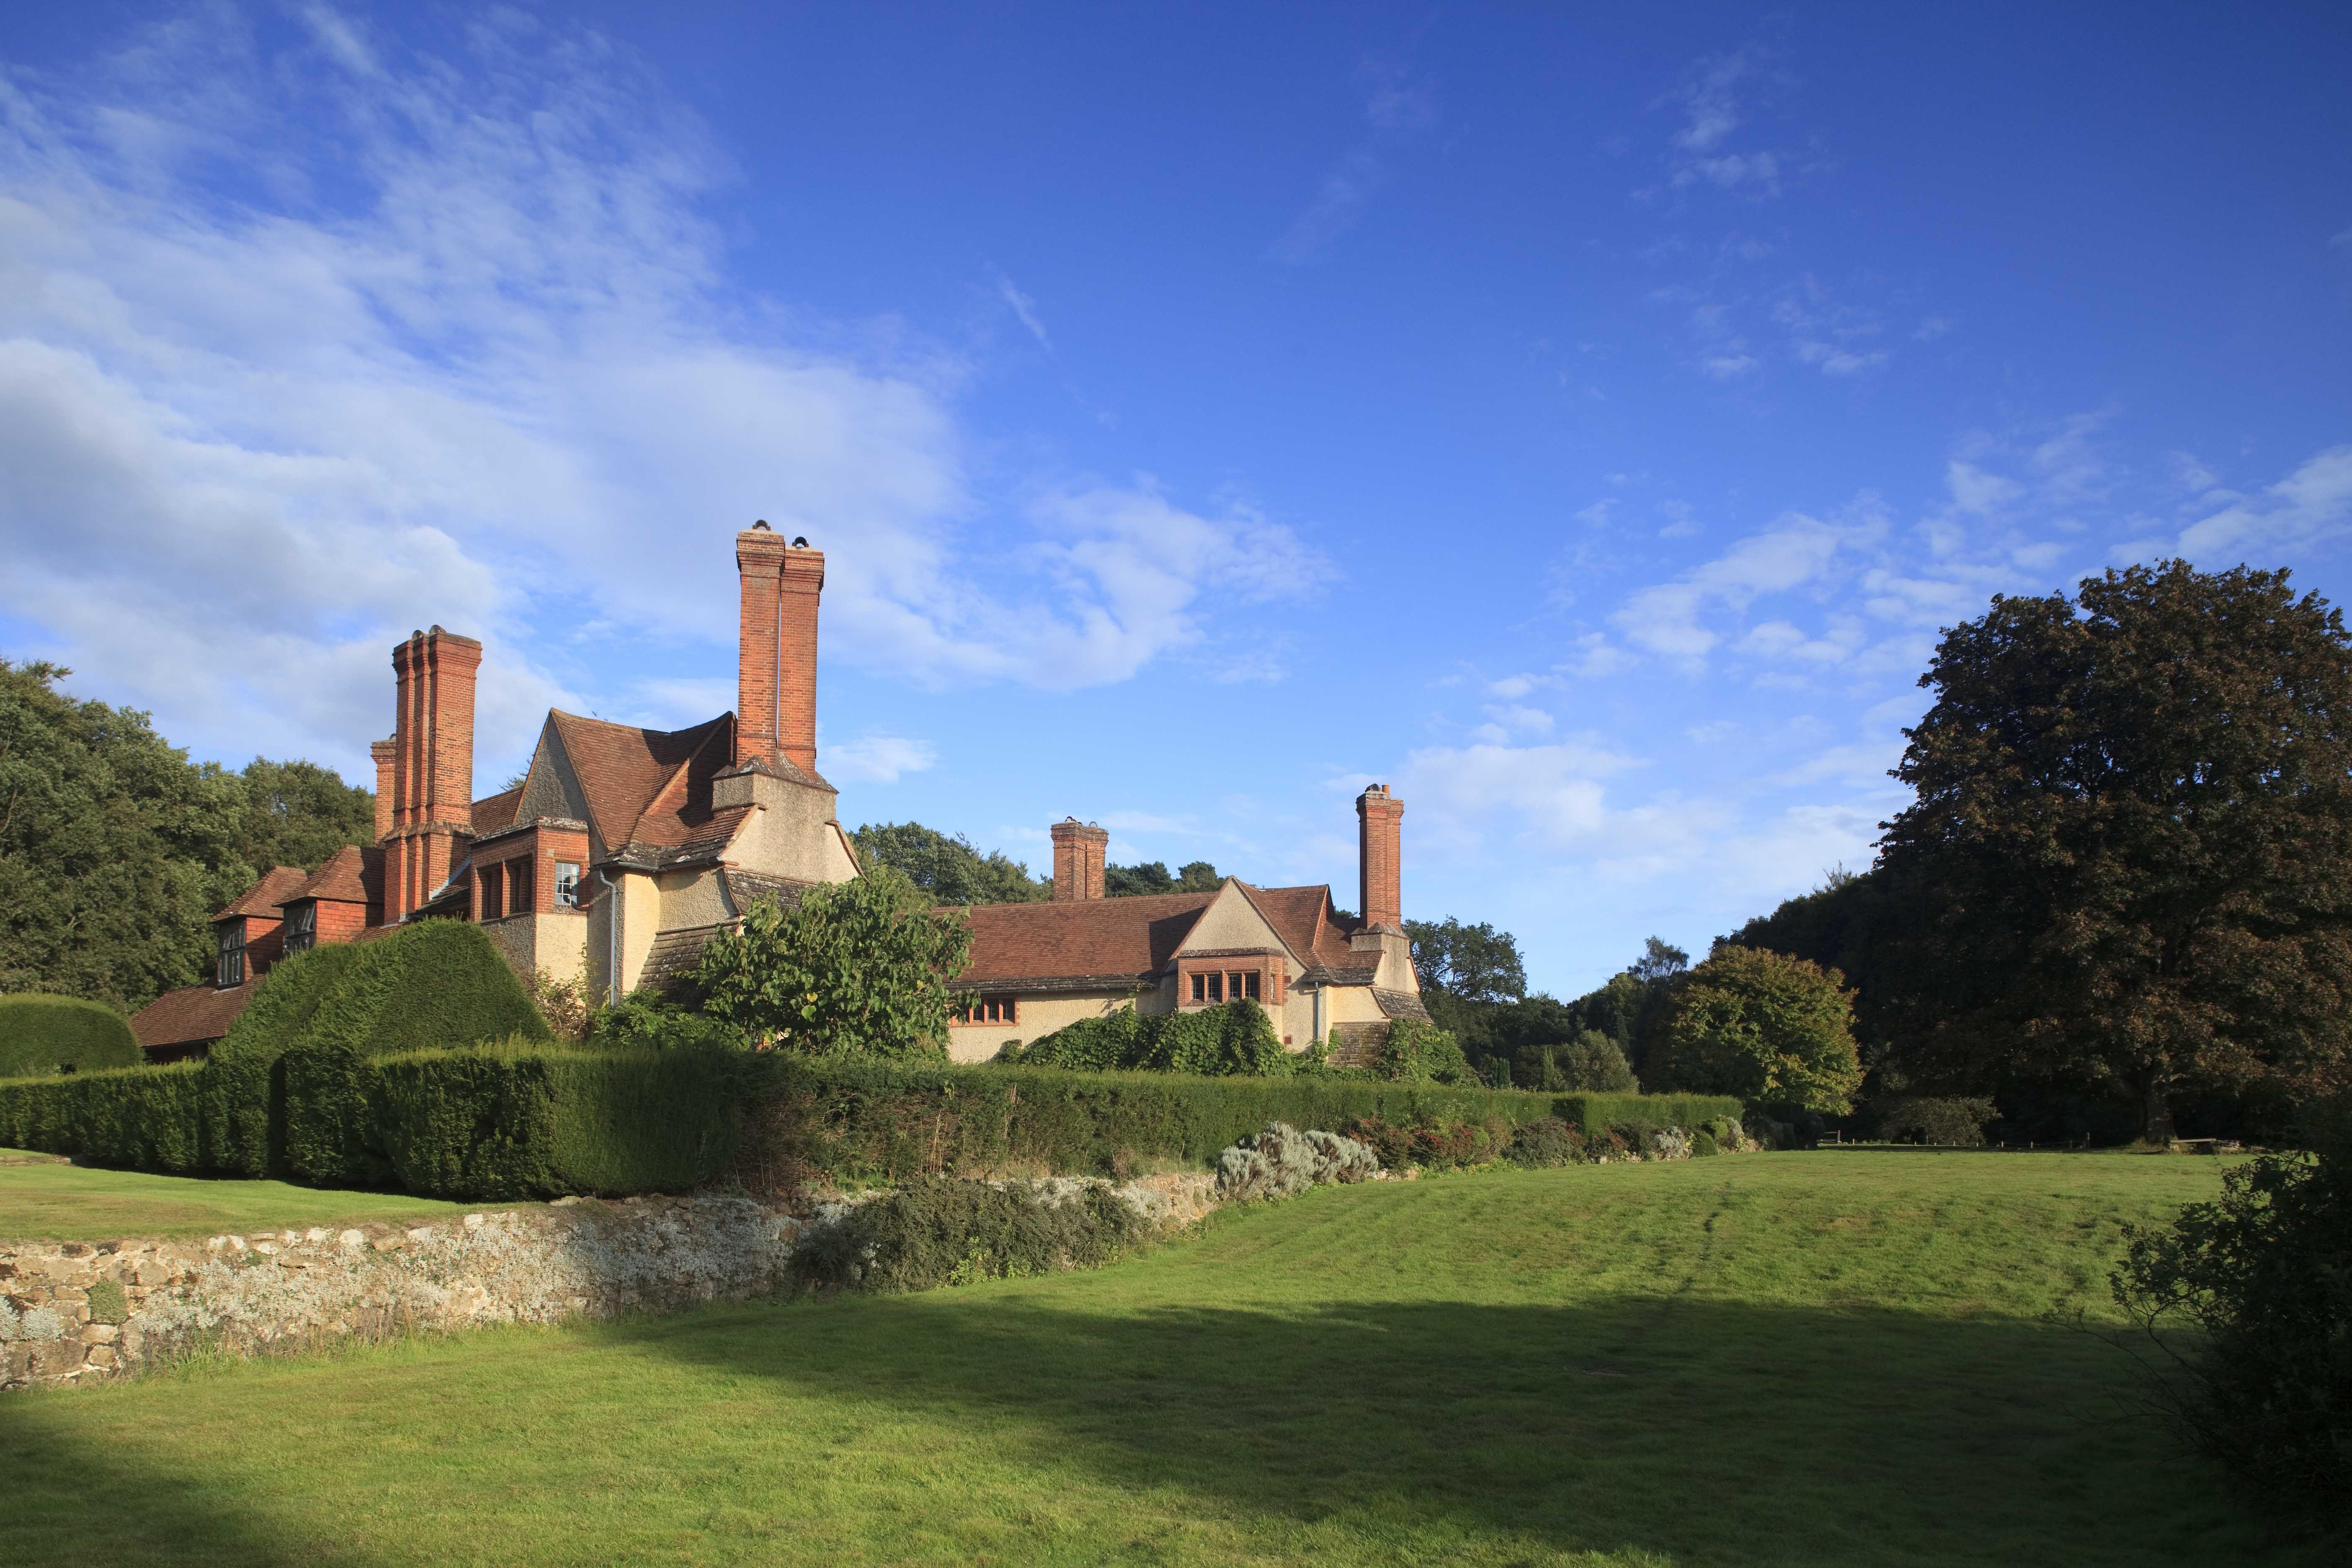 Goddards, Abinger Common, Surrey http://www.landmarktrust.org.uk/search-and-book/properties/goddards-8013  #Goddards #Surrey #AbingerCommon #sunshine #shortbreaks #garden #holiday #historicholidays #LandmarkTrust